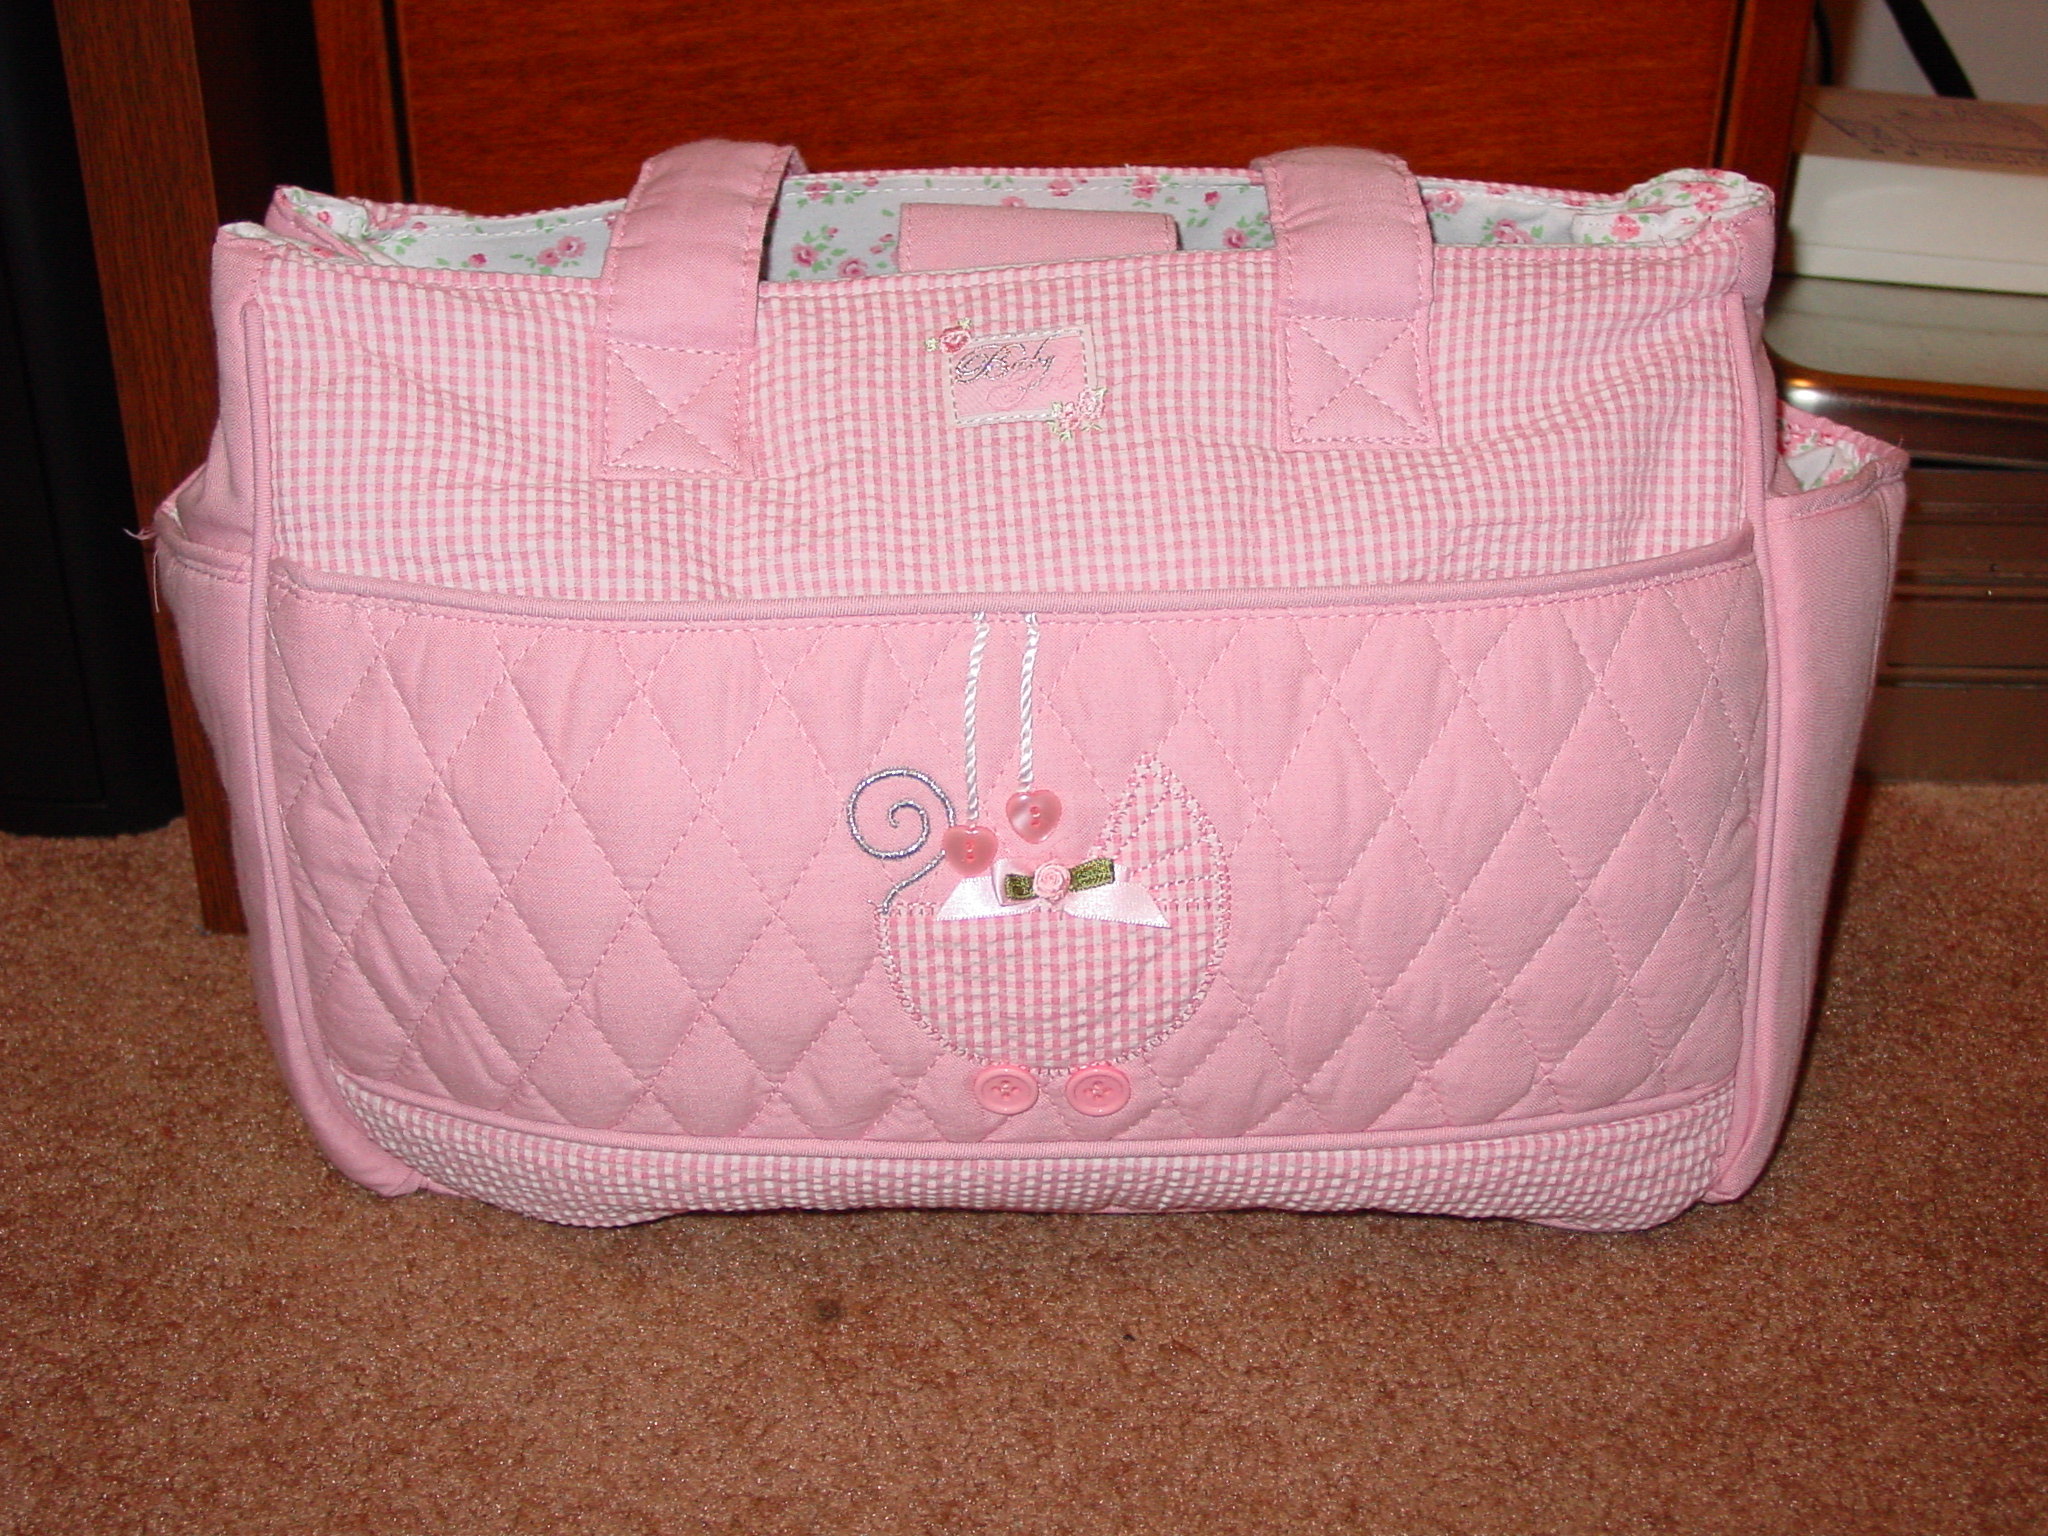 97ceba560044 Diaper bag - Wikipedia